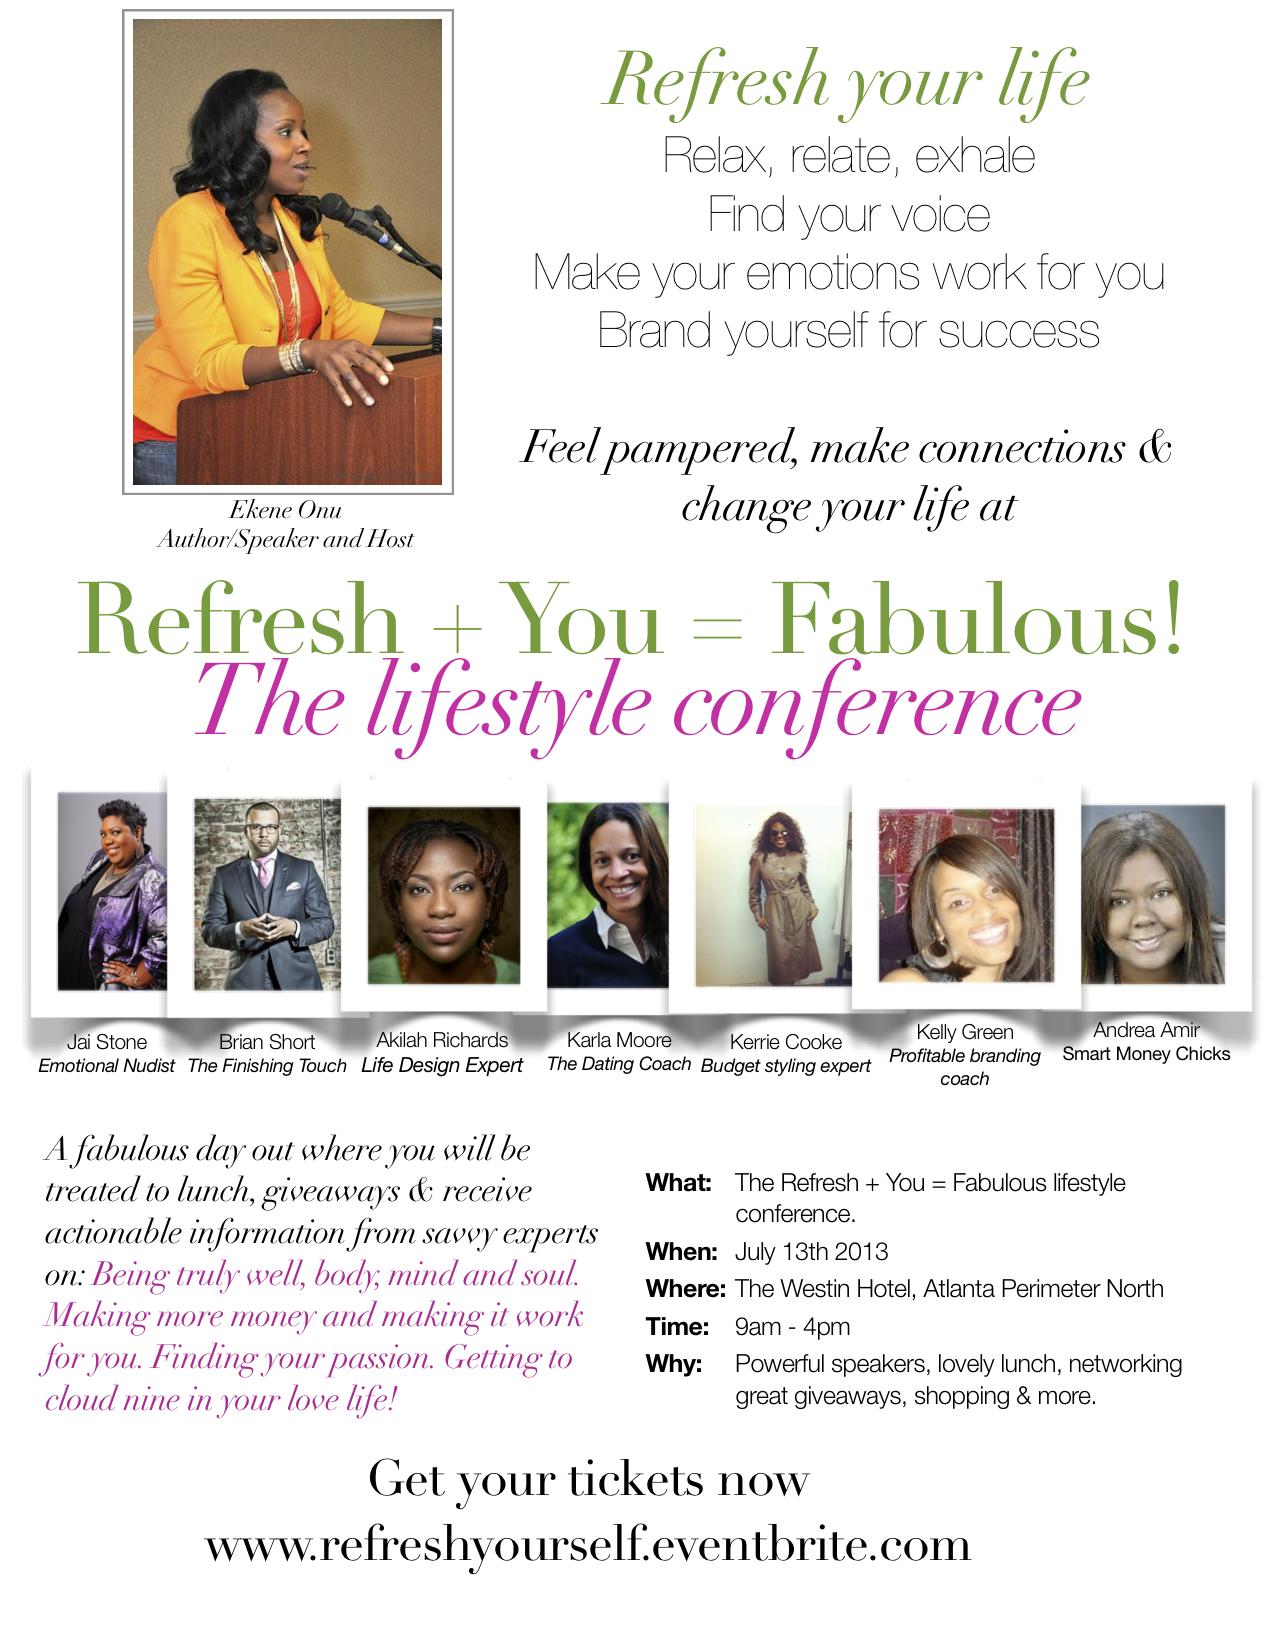 Refresh + You = Fabulous Event in Atlanta